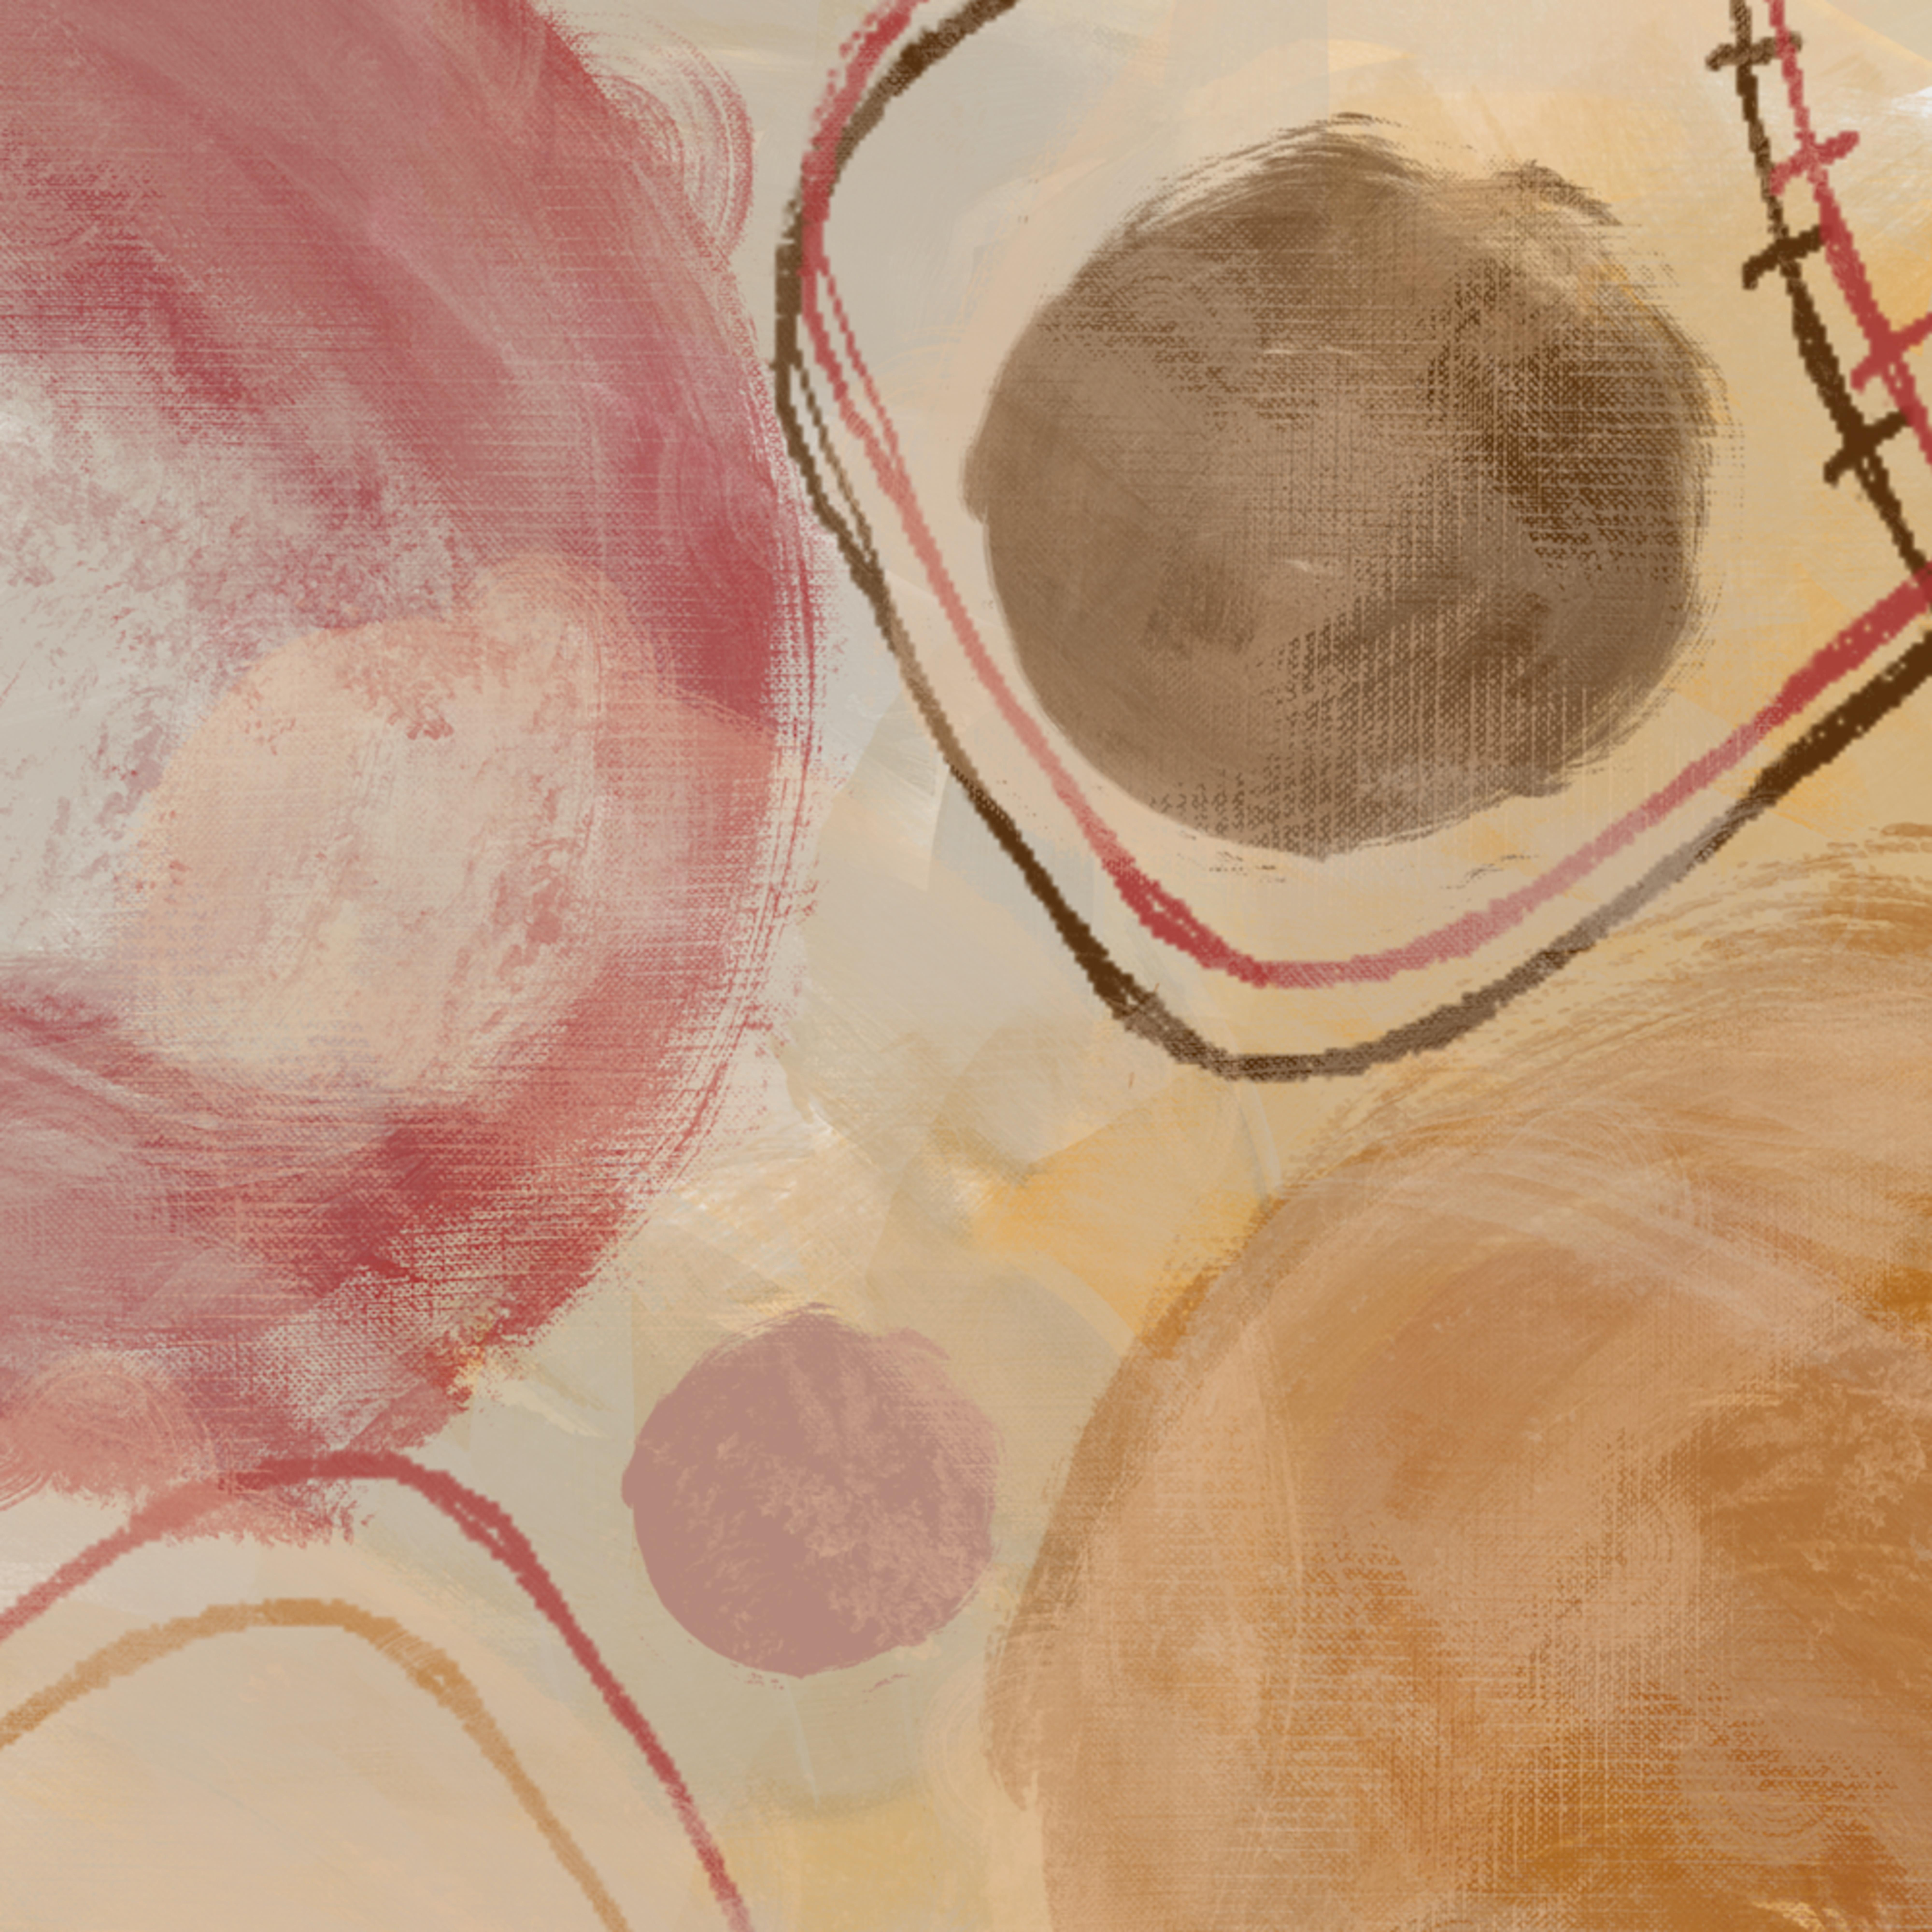 Abstract art 80 12 yzovu4